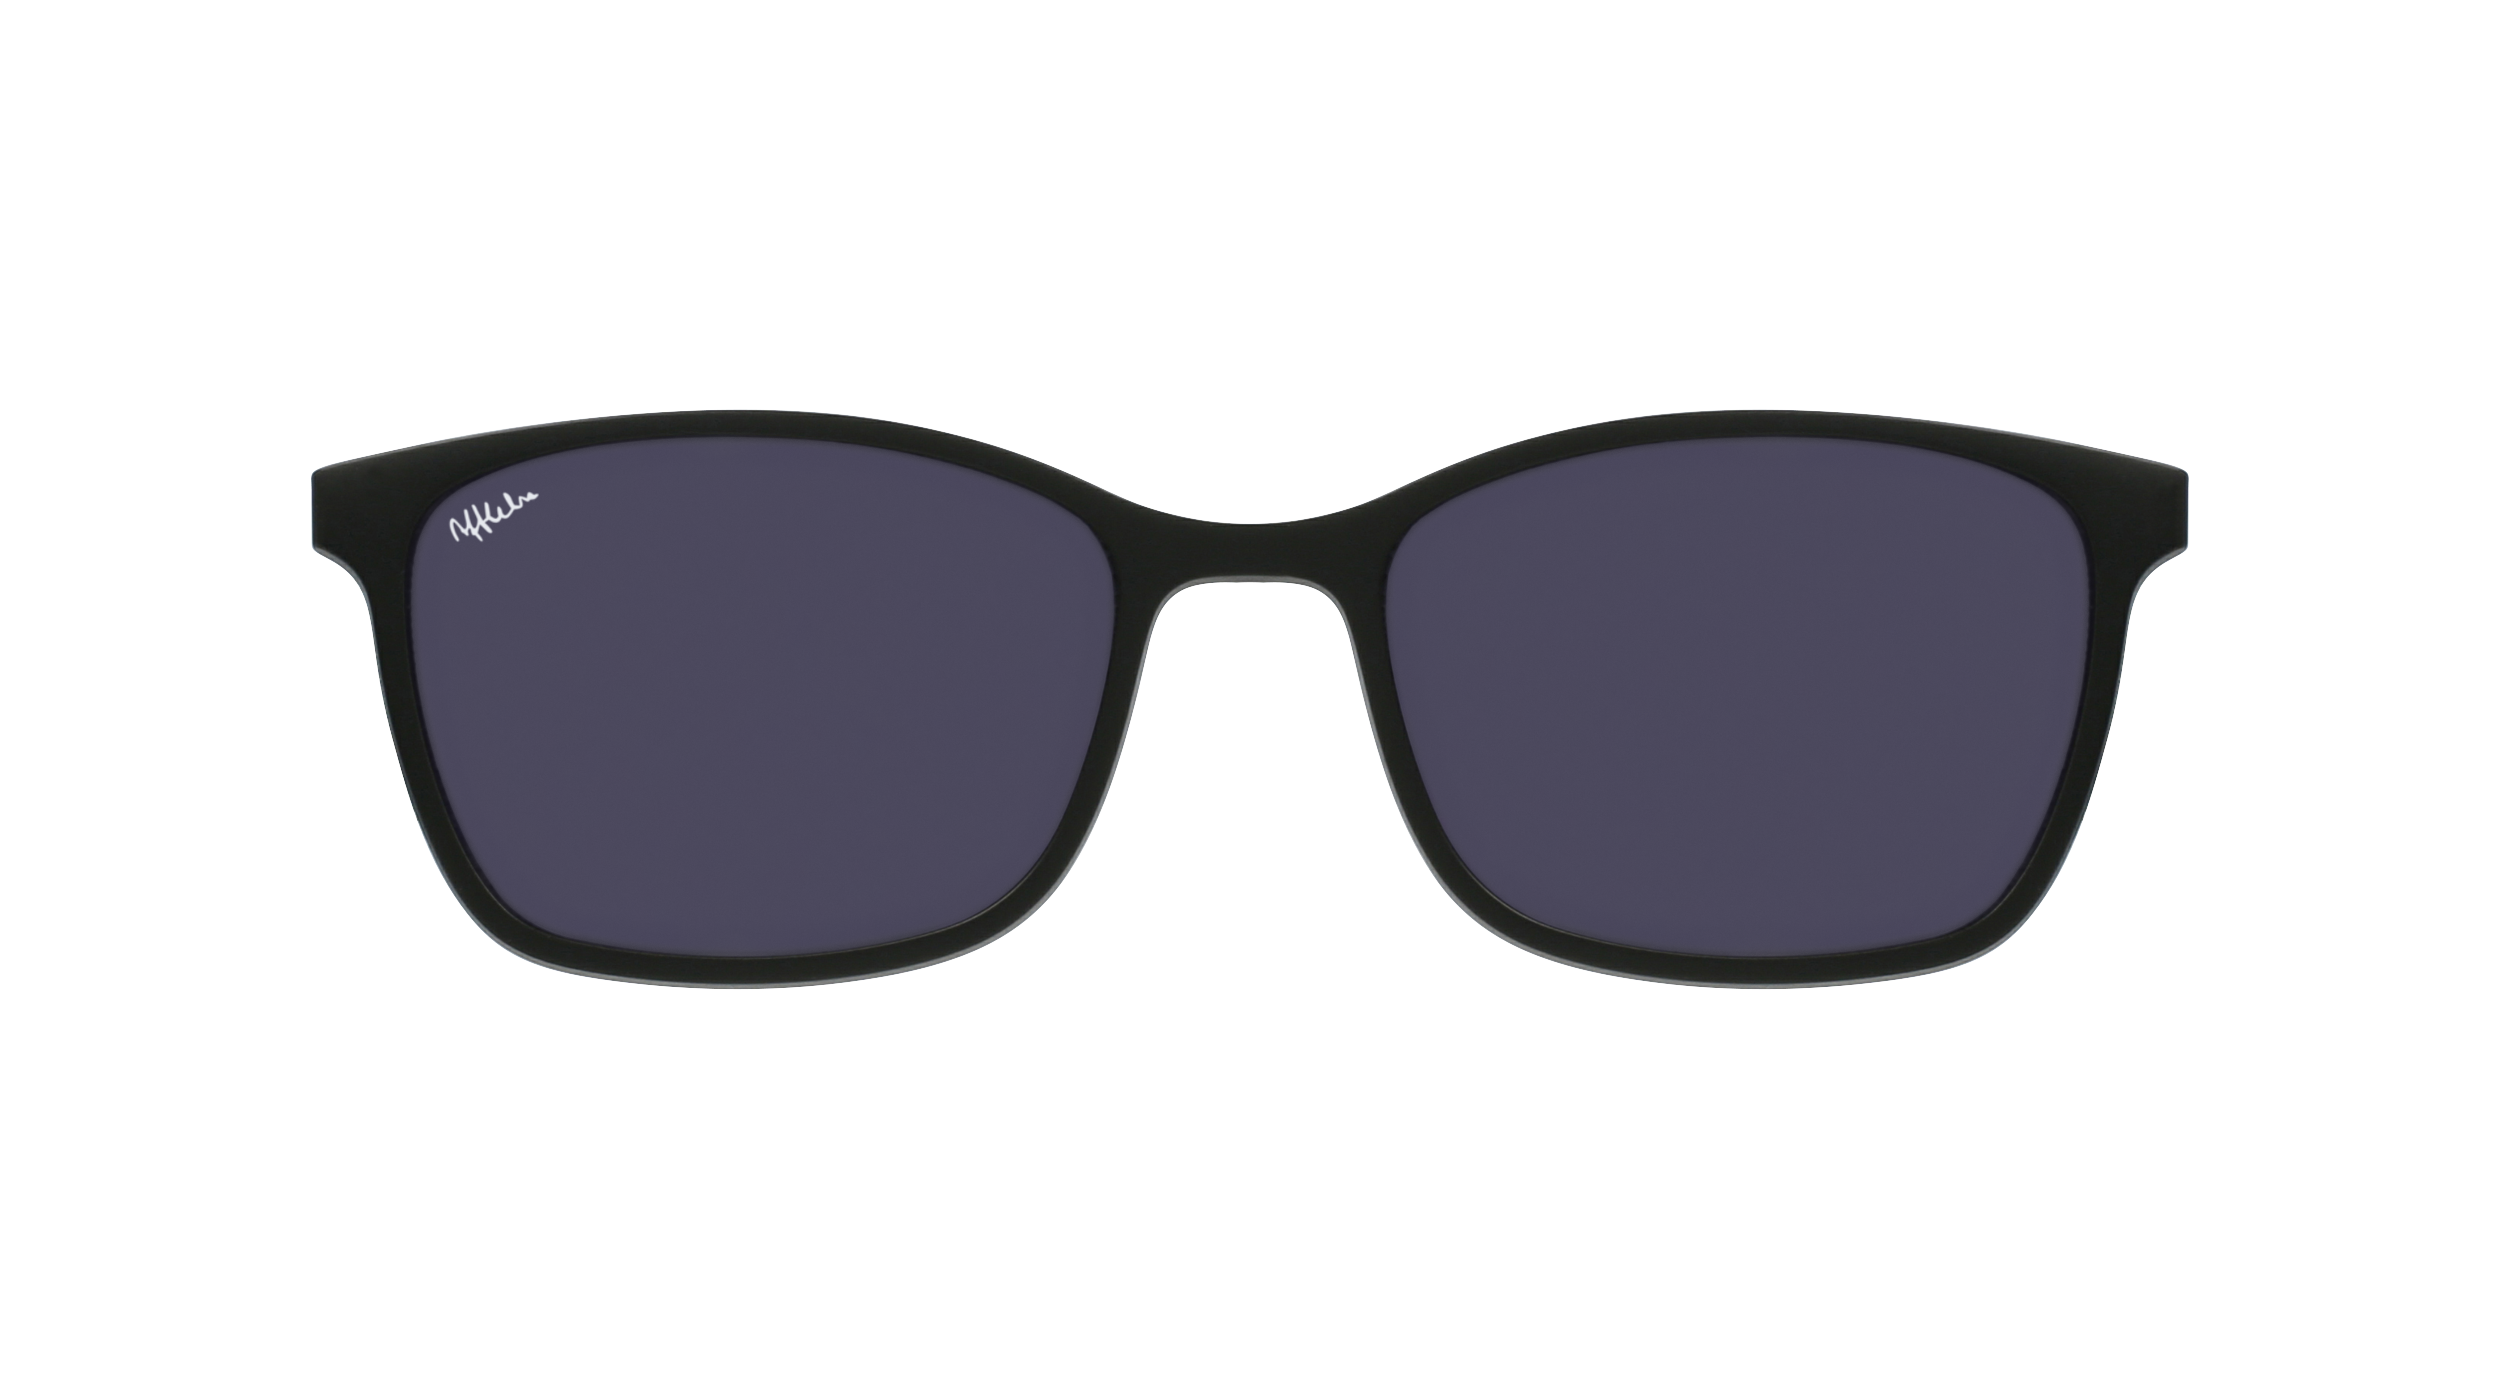 afflelou/france/products/smart_clip/clips_glasses/07630036459041.png